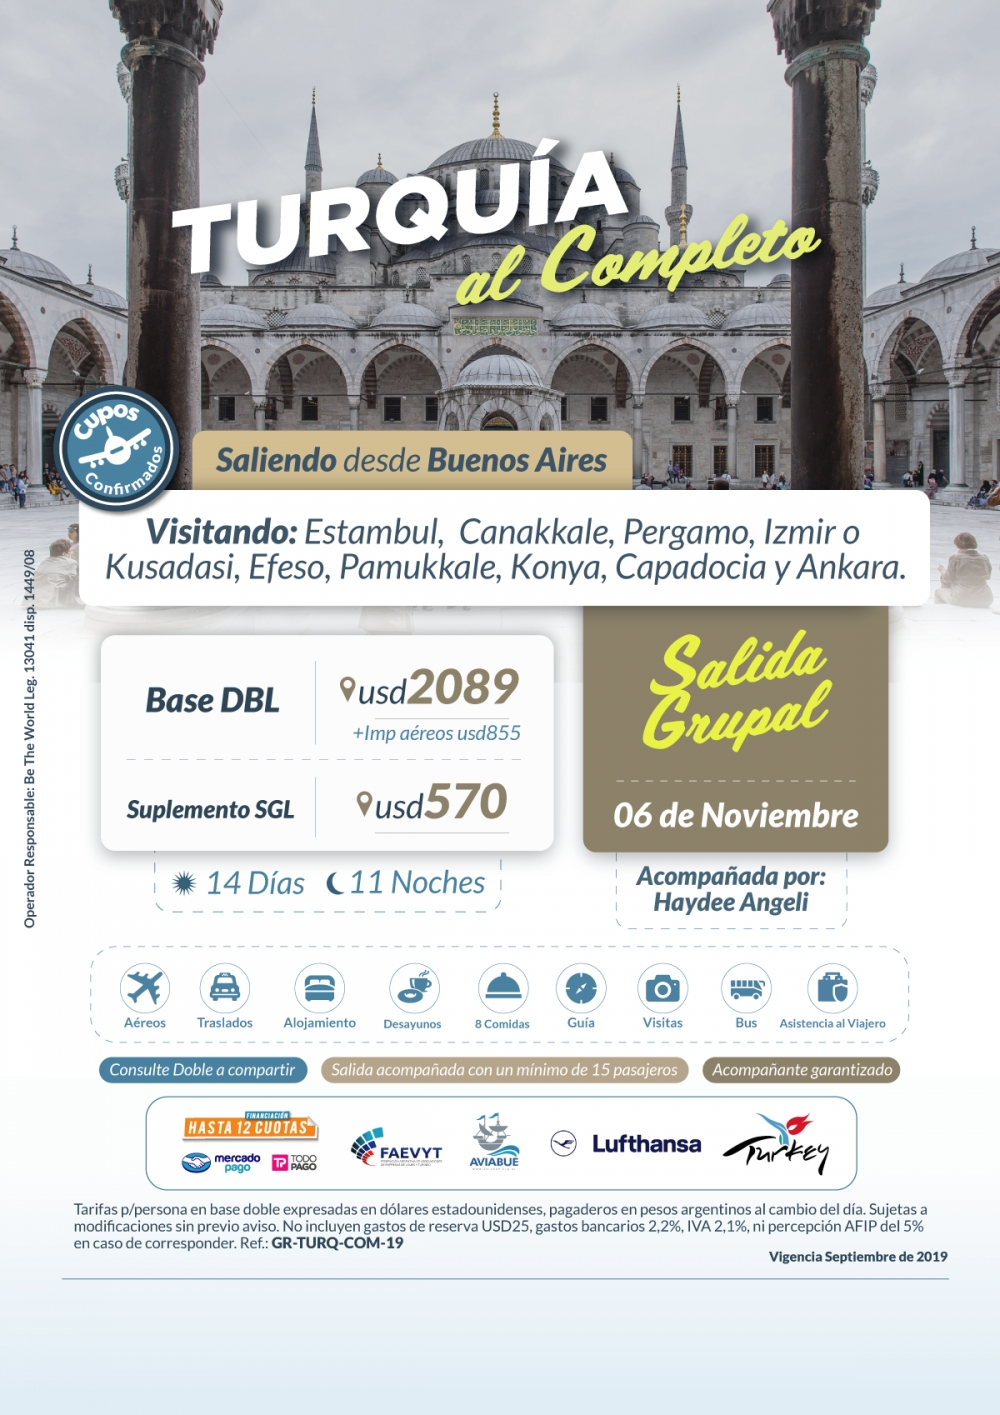 TURQUIA AL COMPLETO - Salida Grupal - 06 de Noviembre